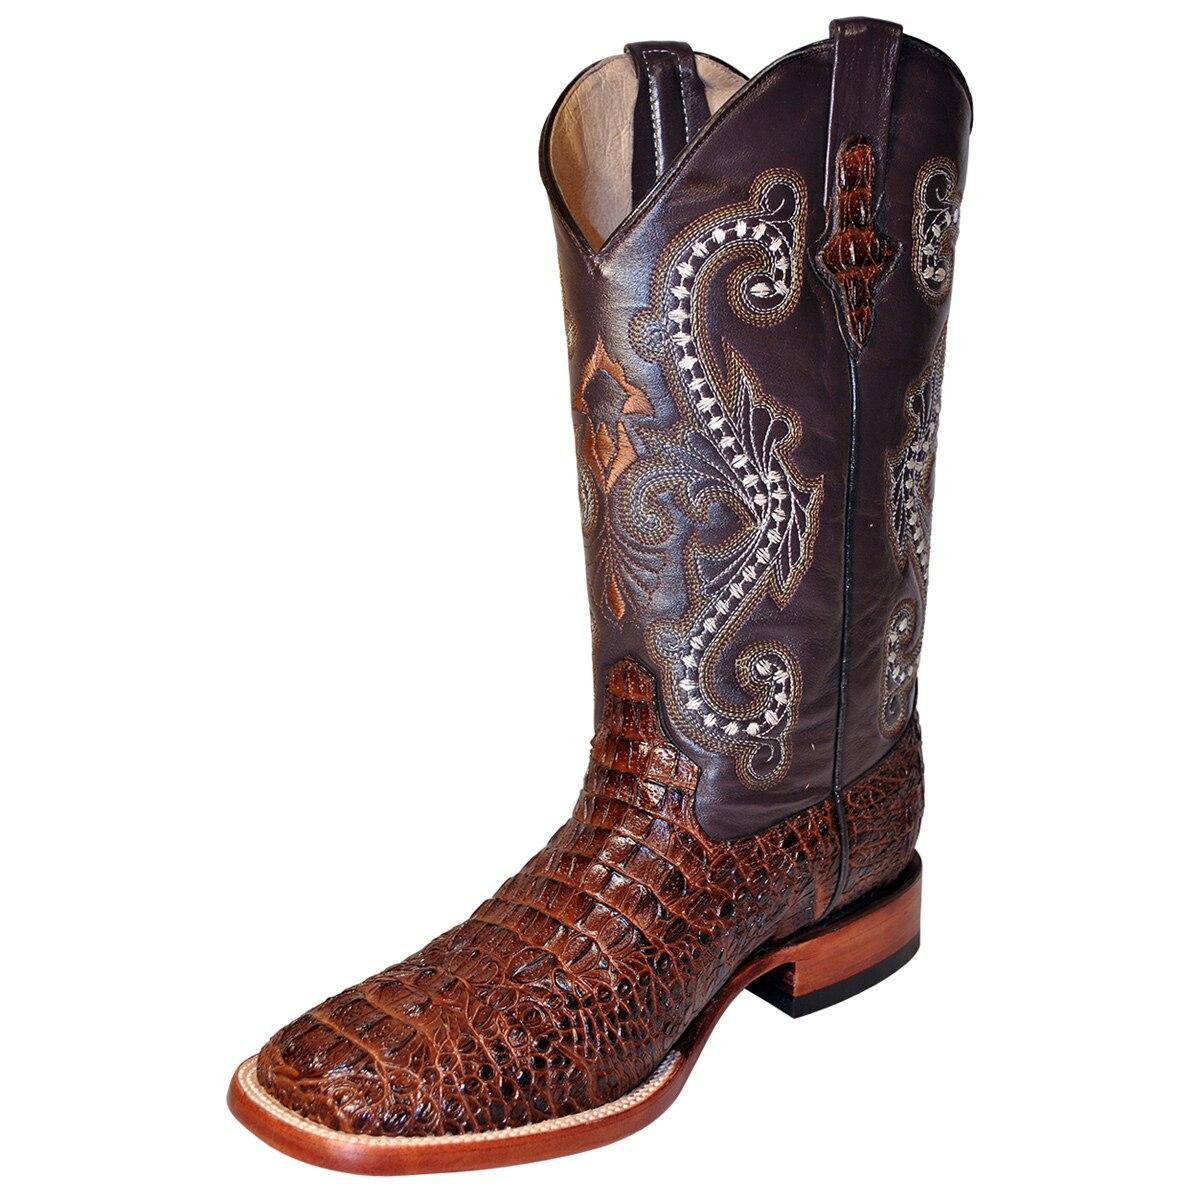 Ferrini Men's Print Caiman Wide Square Toe Boots